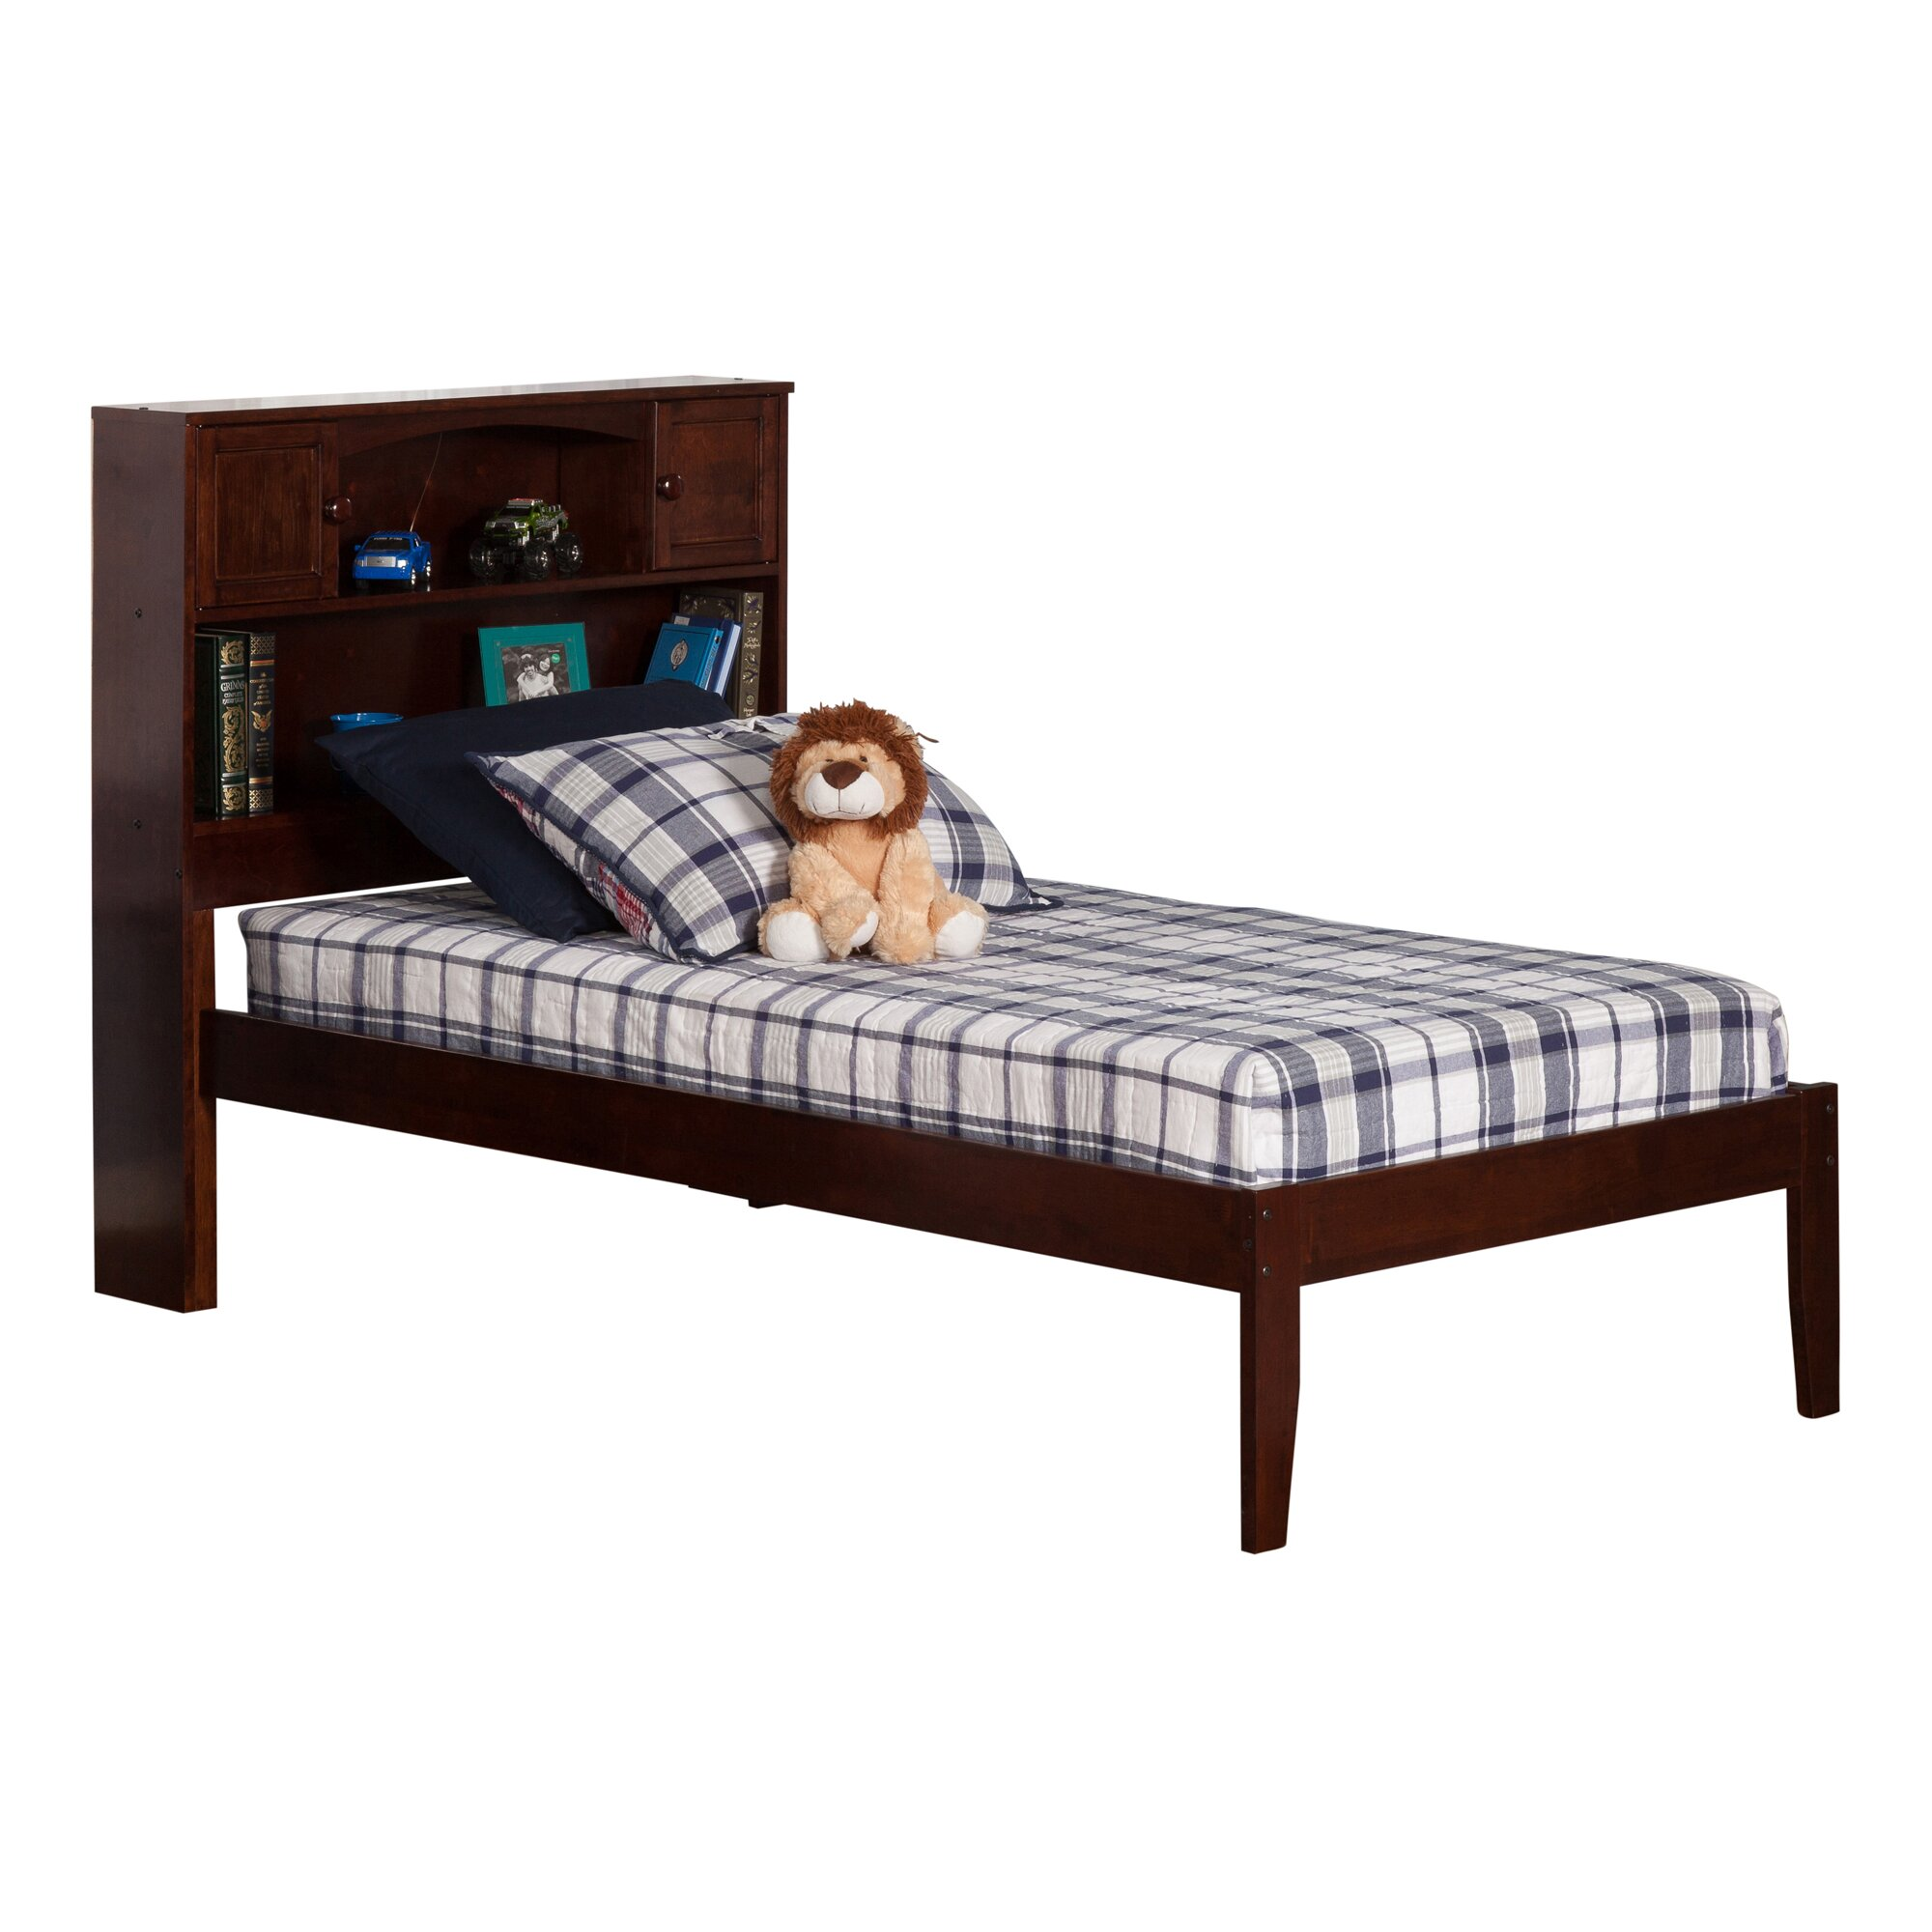 Atlantic Furniture Newport Extra Long Twin Platform Bed